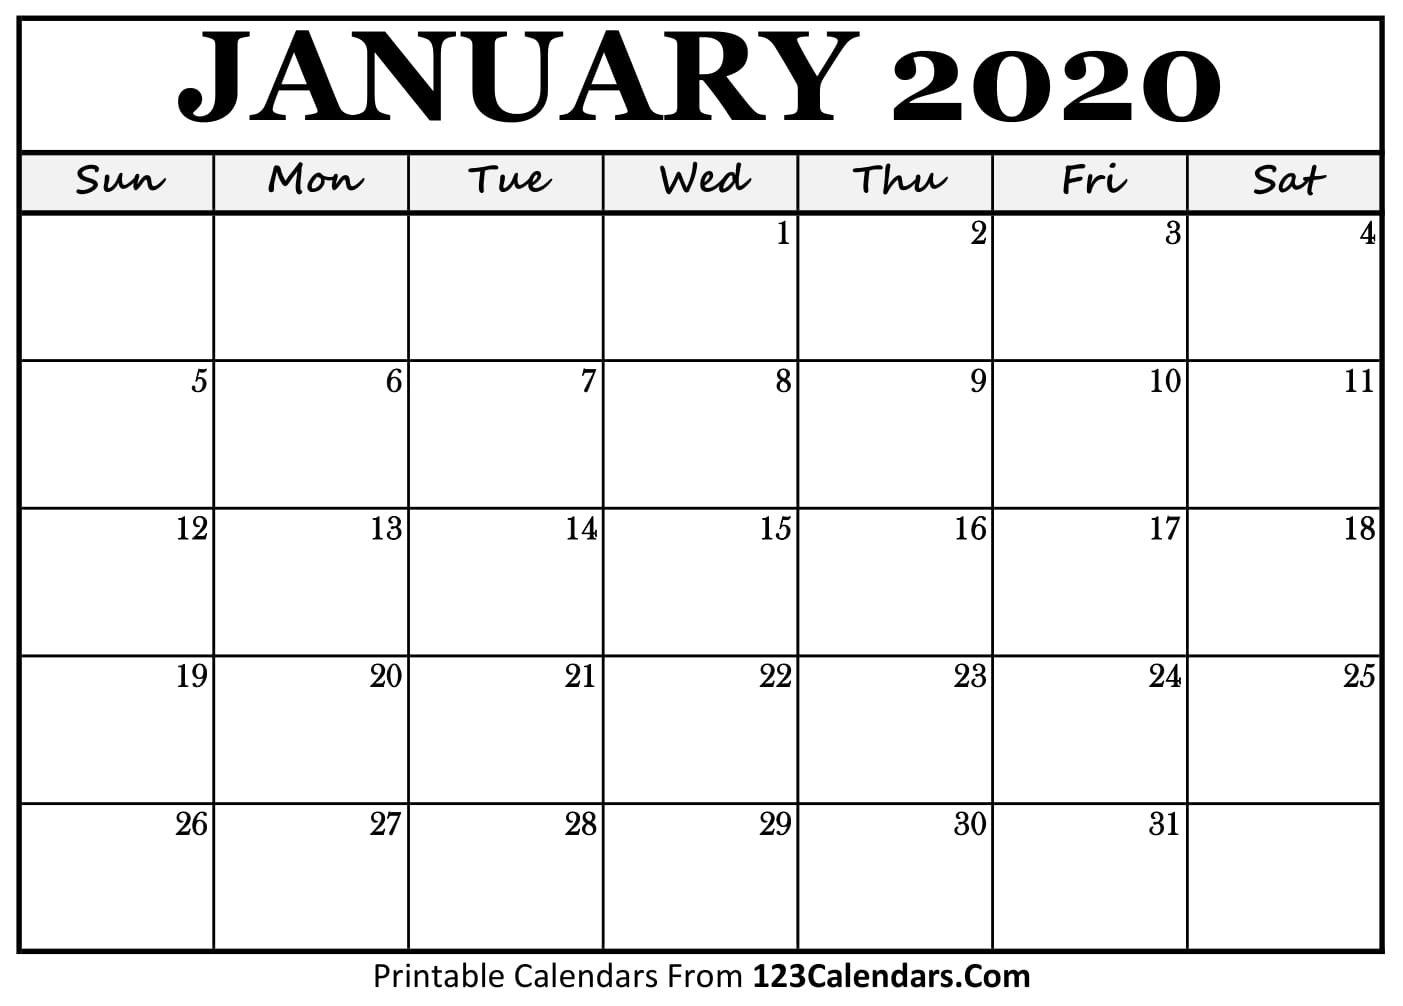 Free Printable Calendar | 123Calendars Blank Calendar I Can Edit And Print